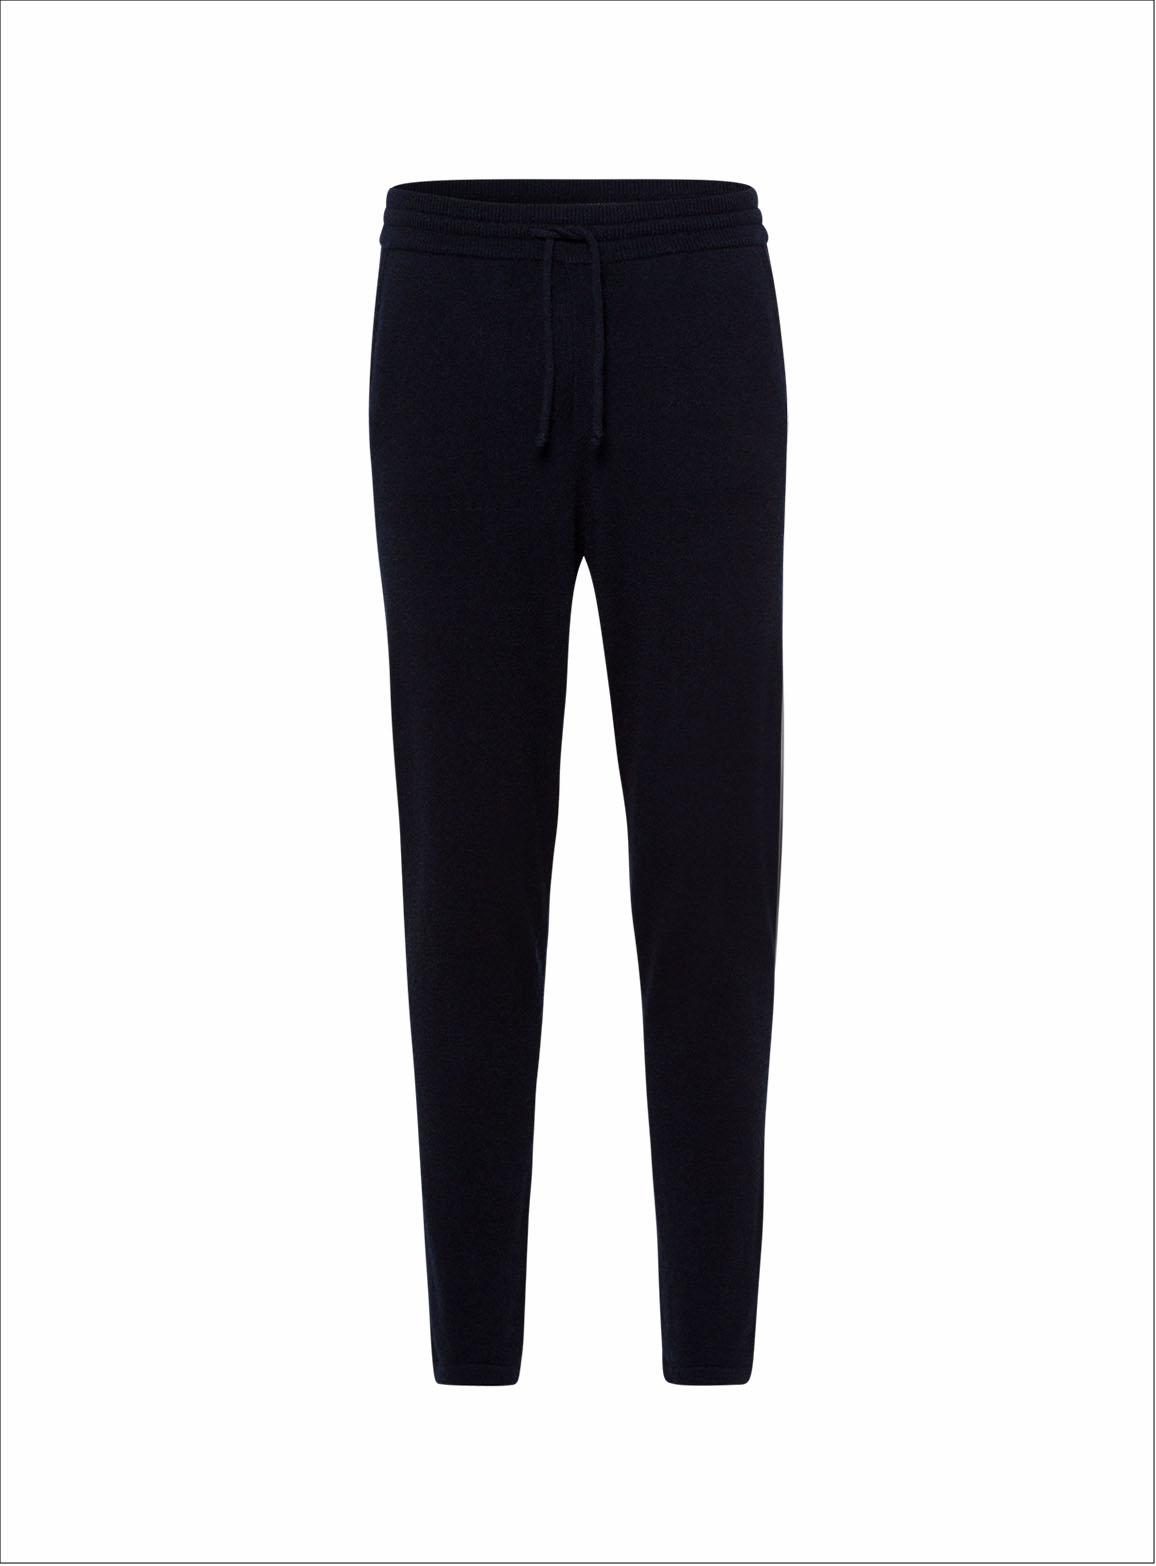 Straight cut trousers in puristic design